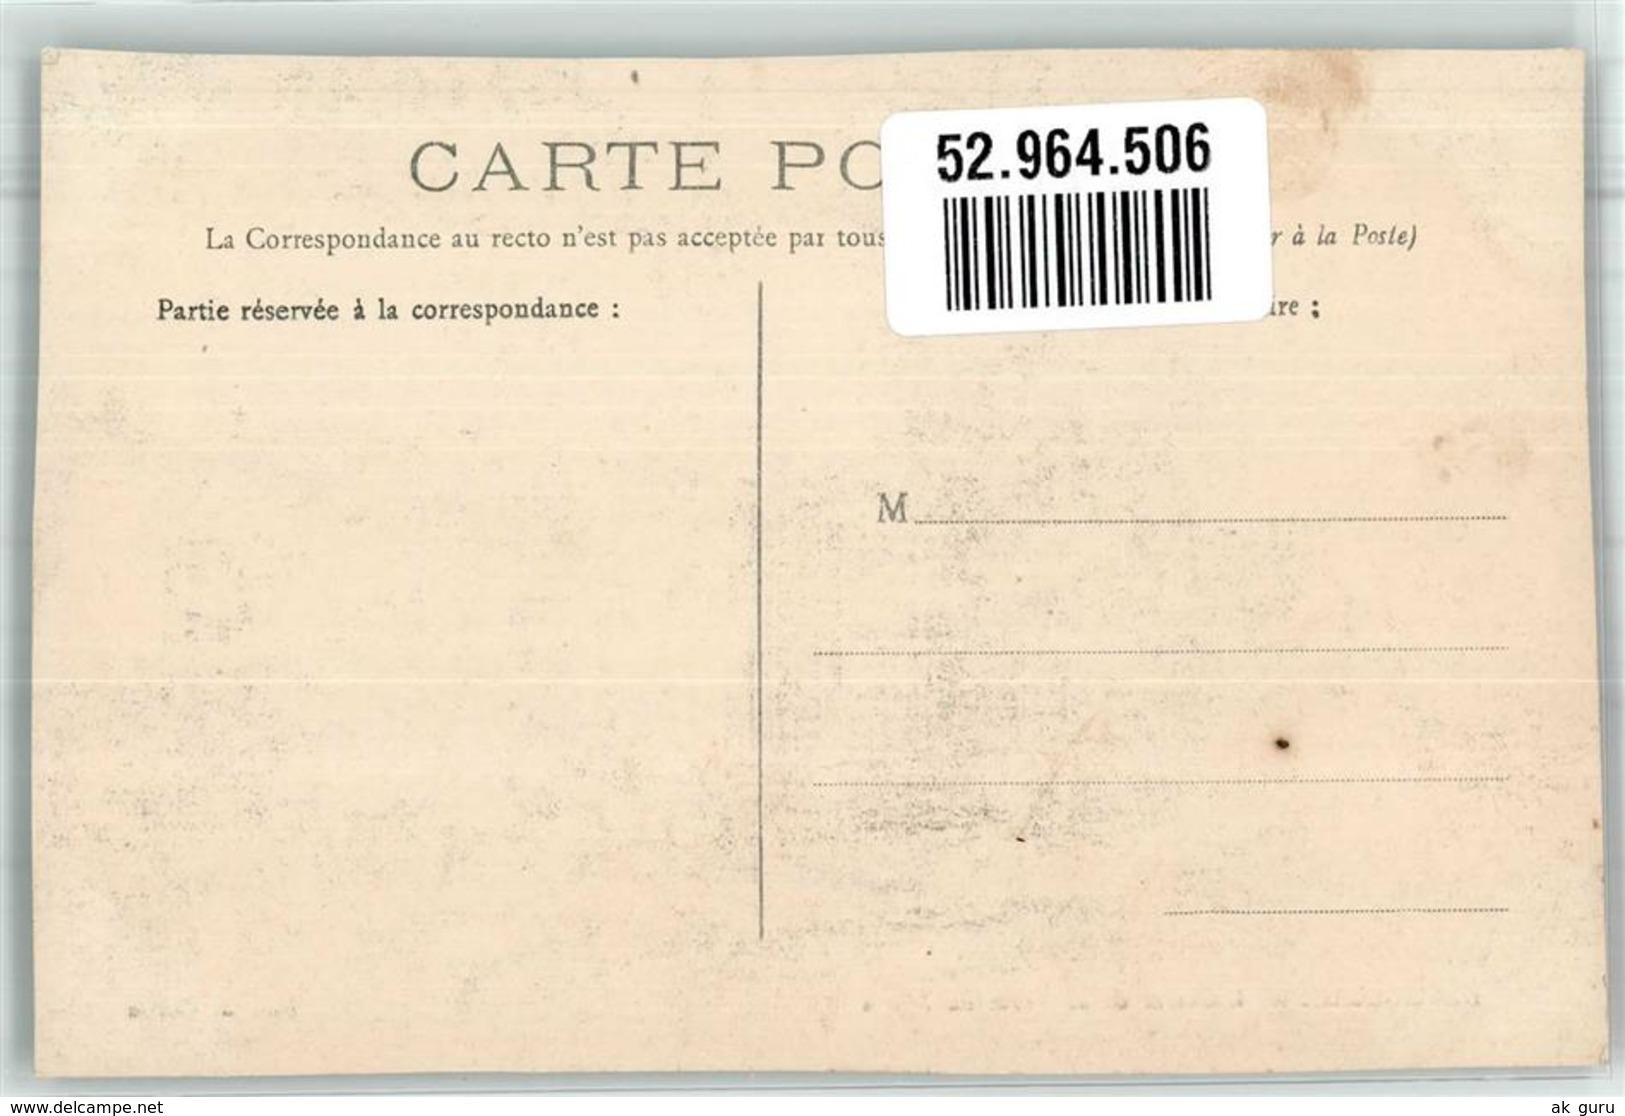 52964506 - Maubeuge - France